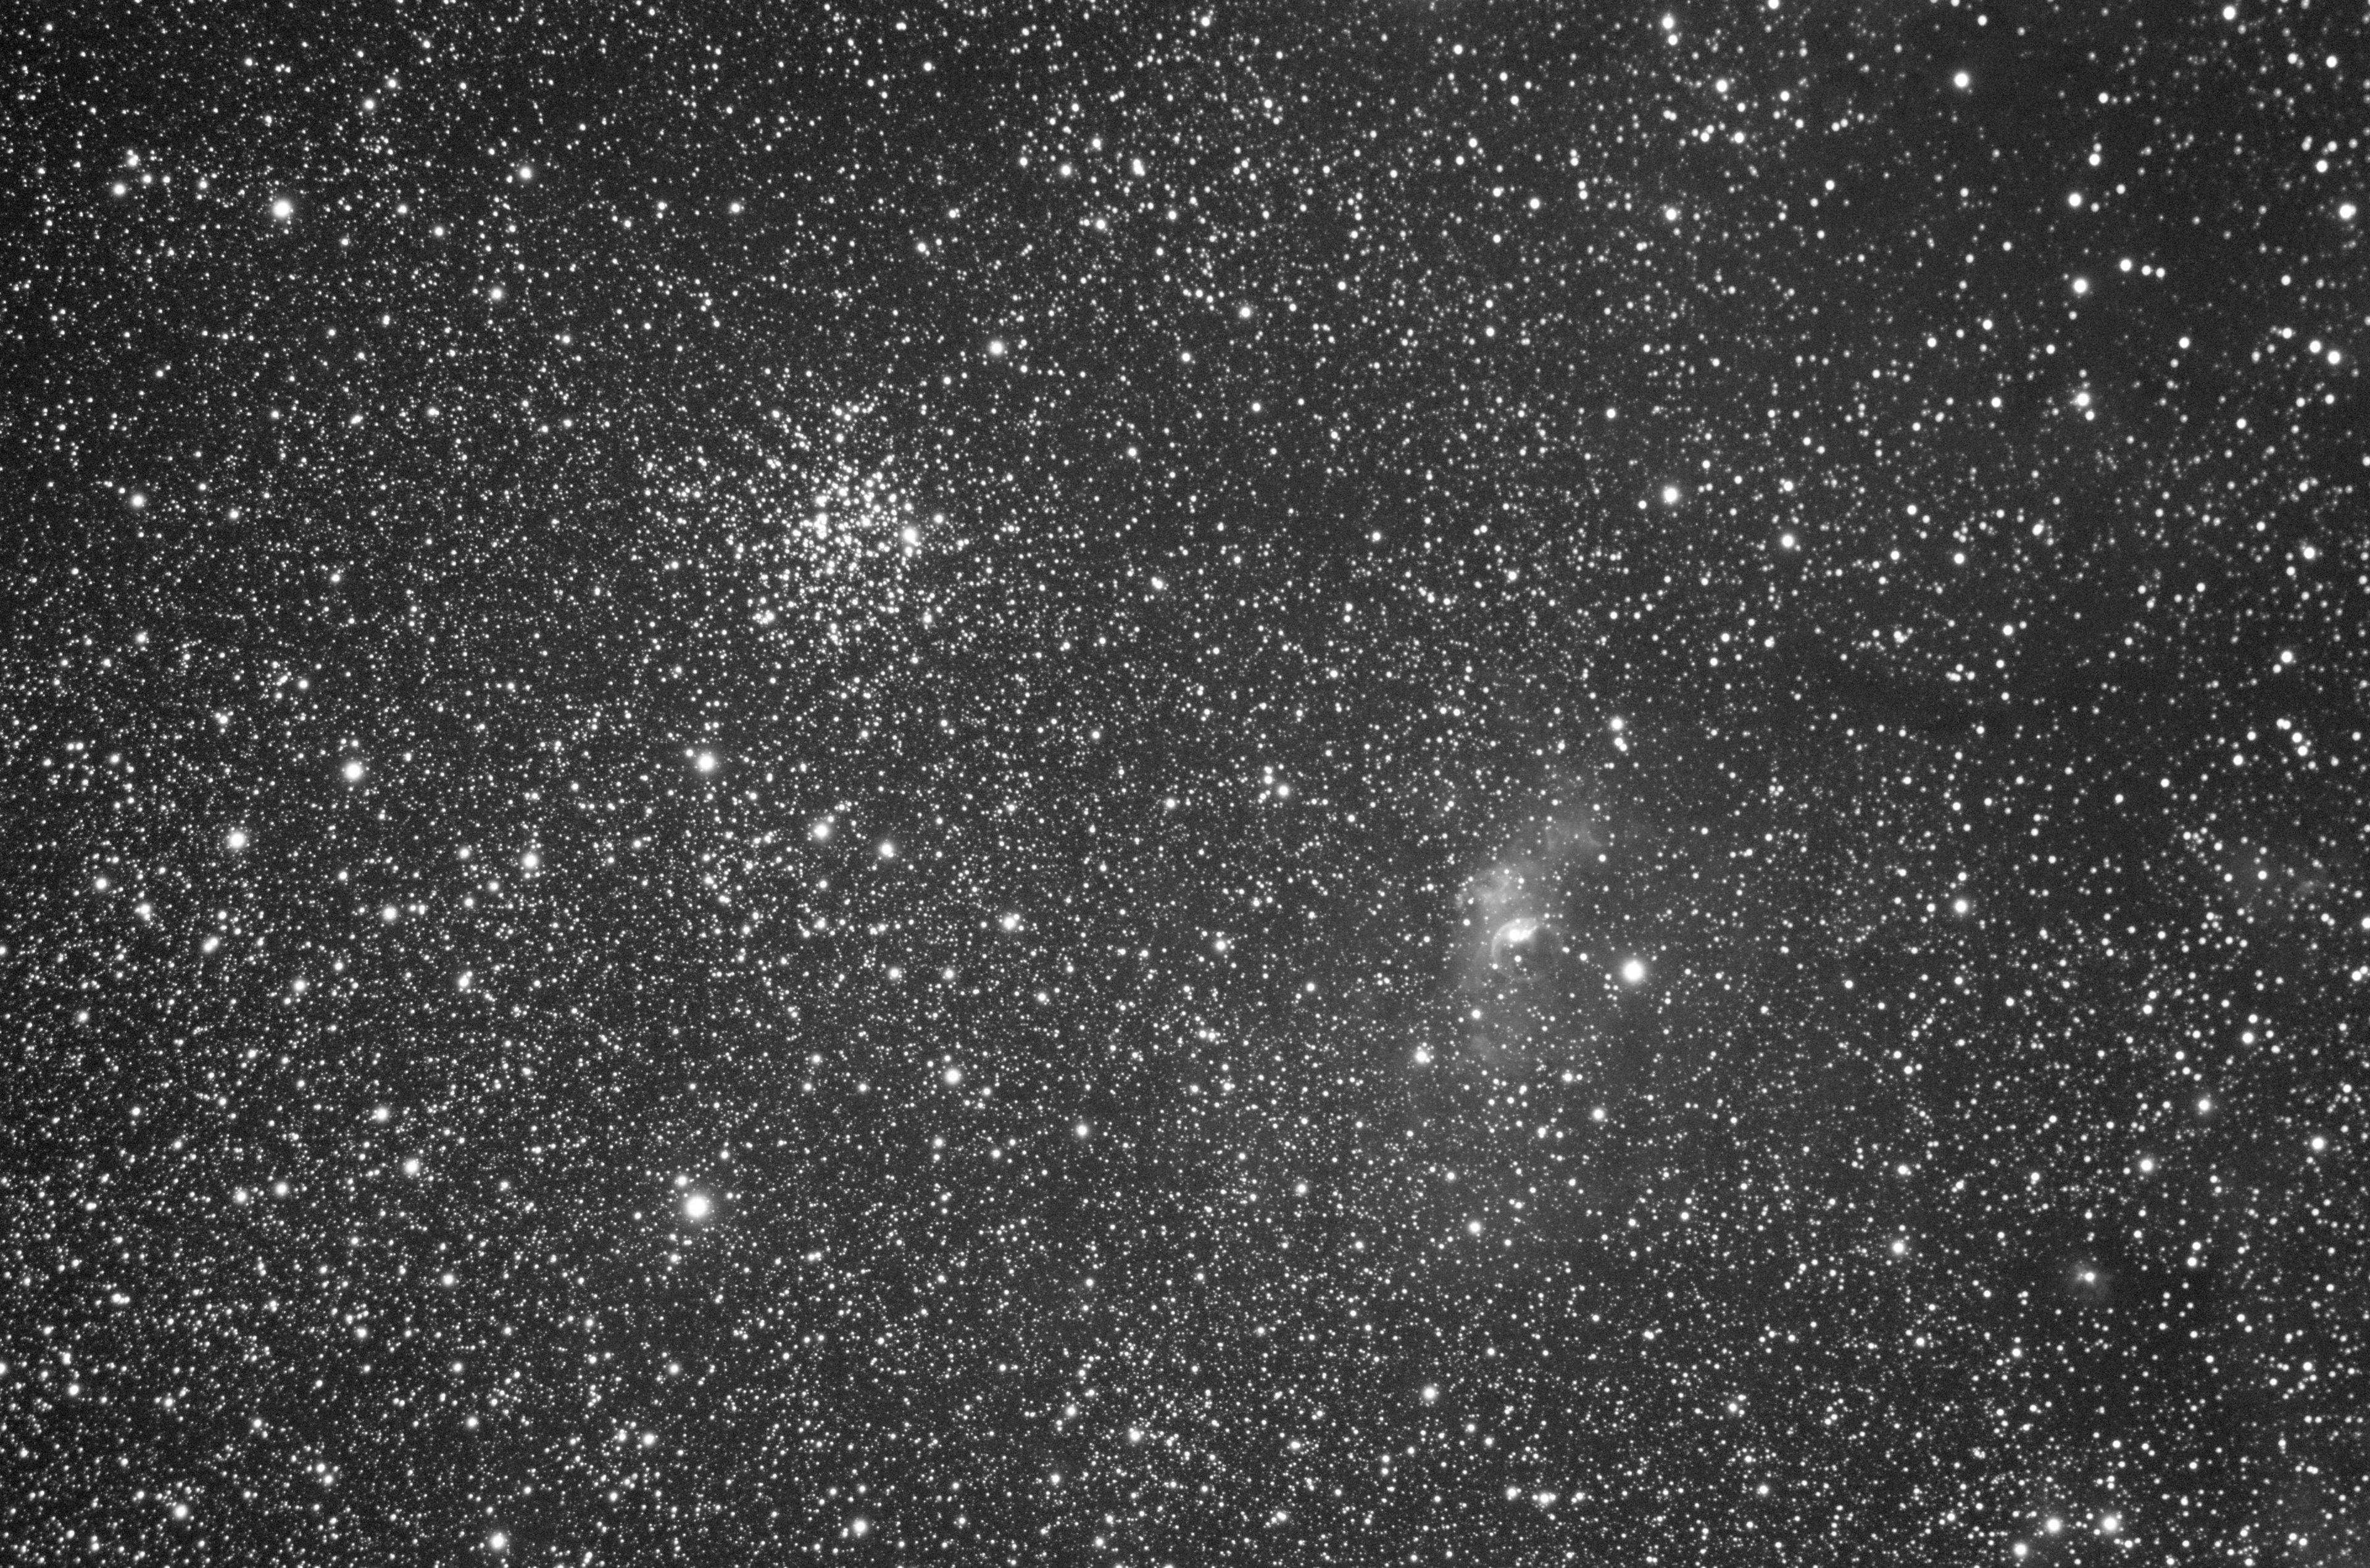 M52_10x90s_gain25.jpg